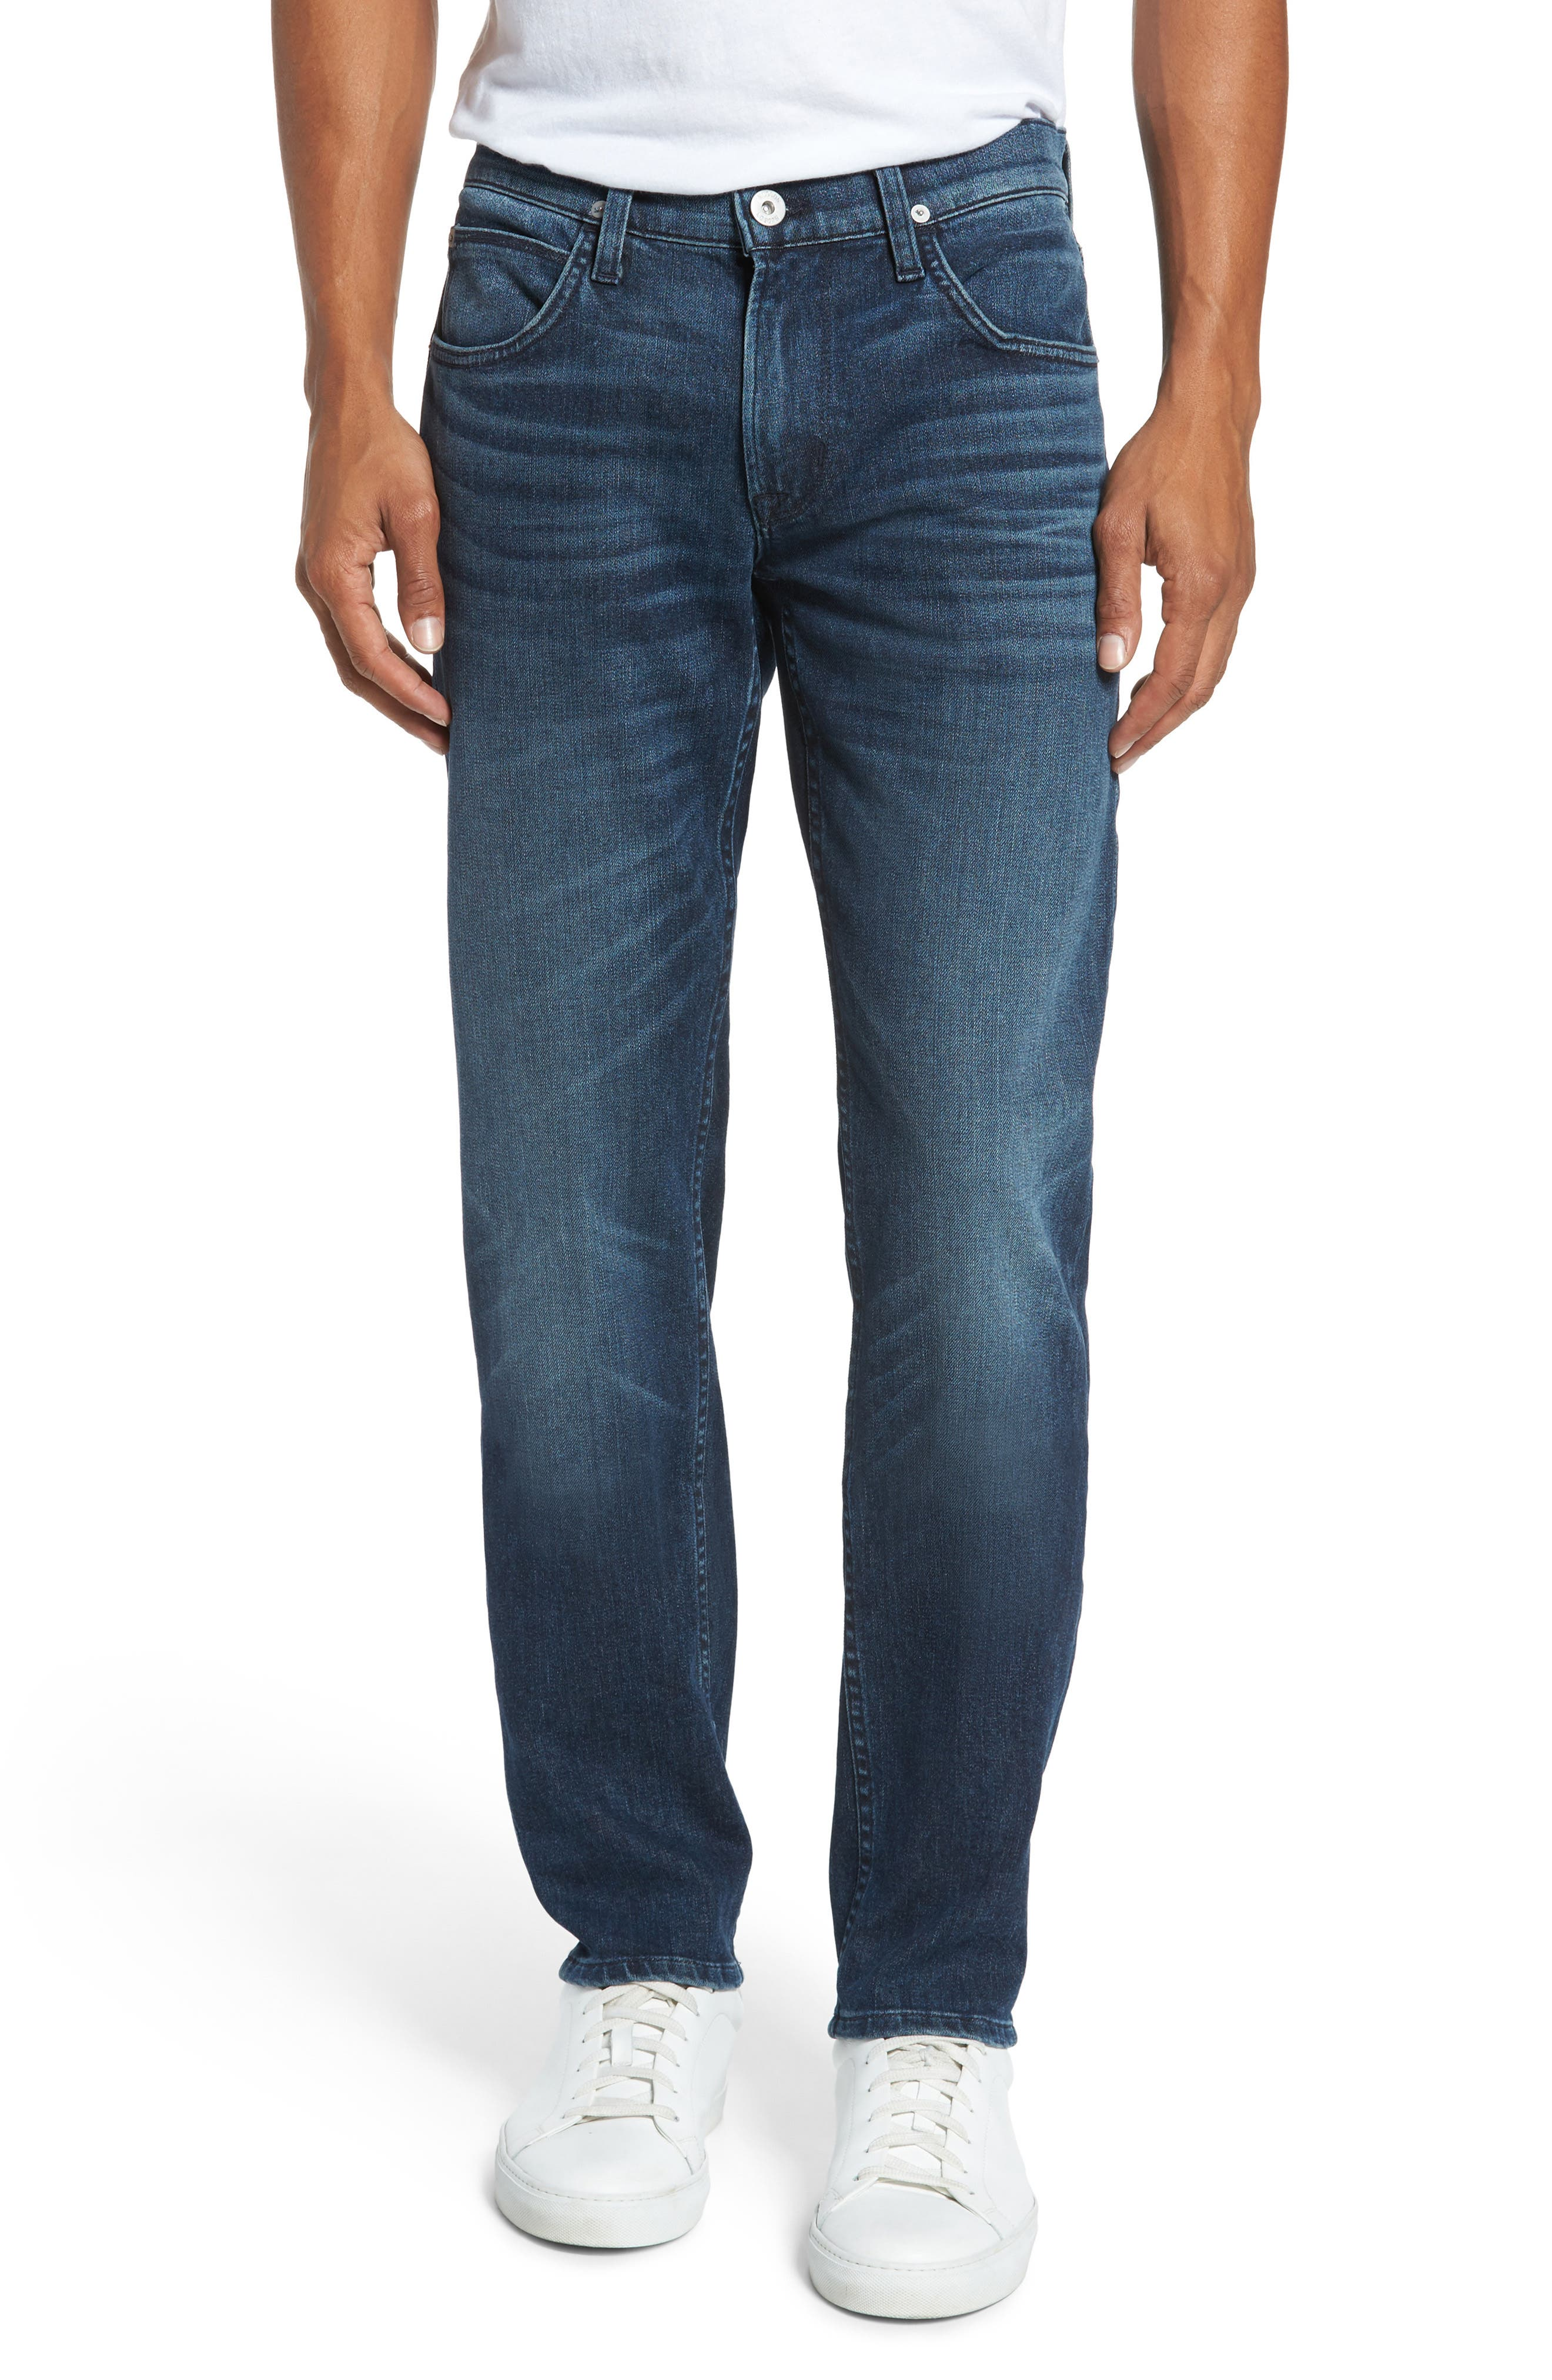 Blake Slim Fit Jeans,                             Main thumbnail 1, color,                             Regret